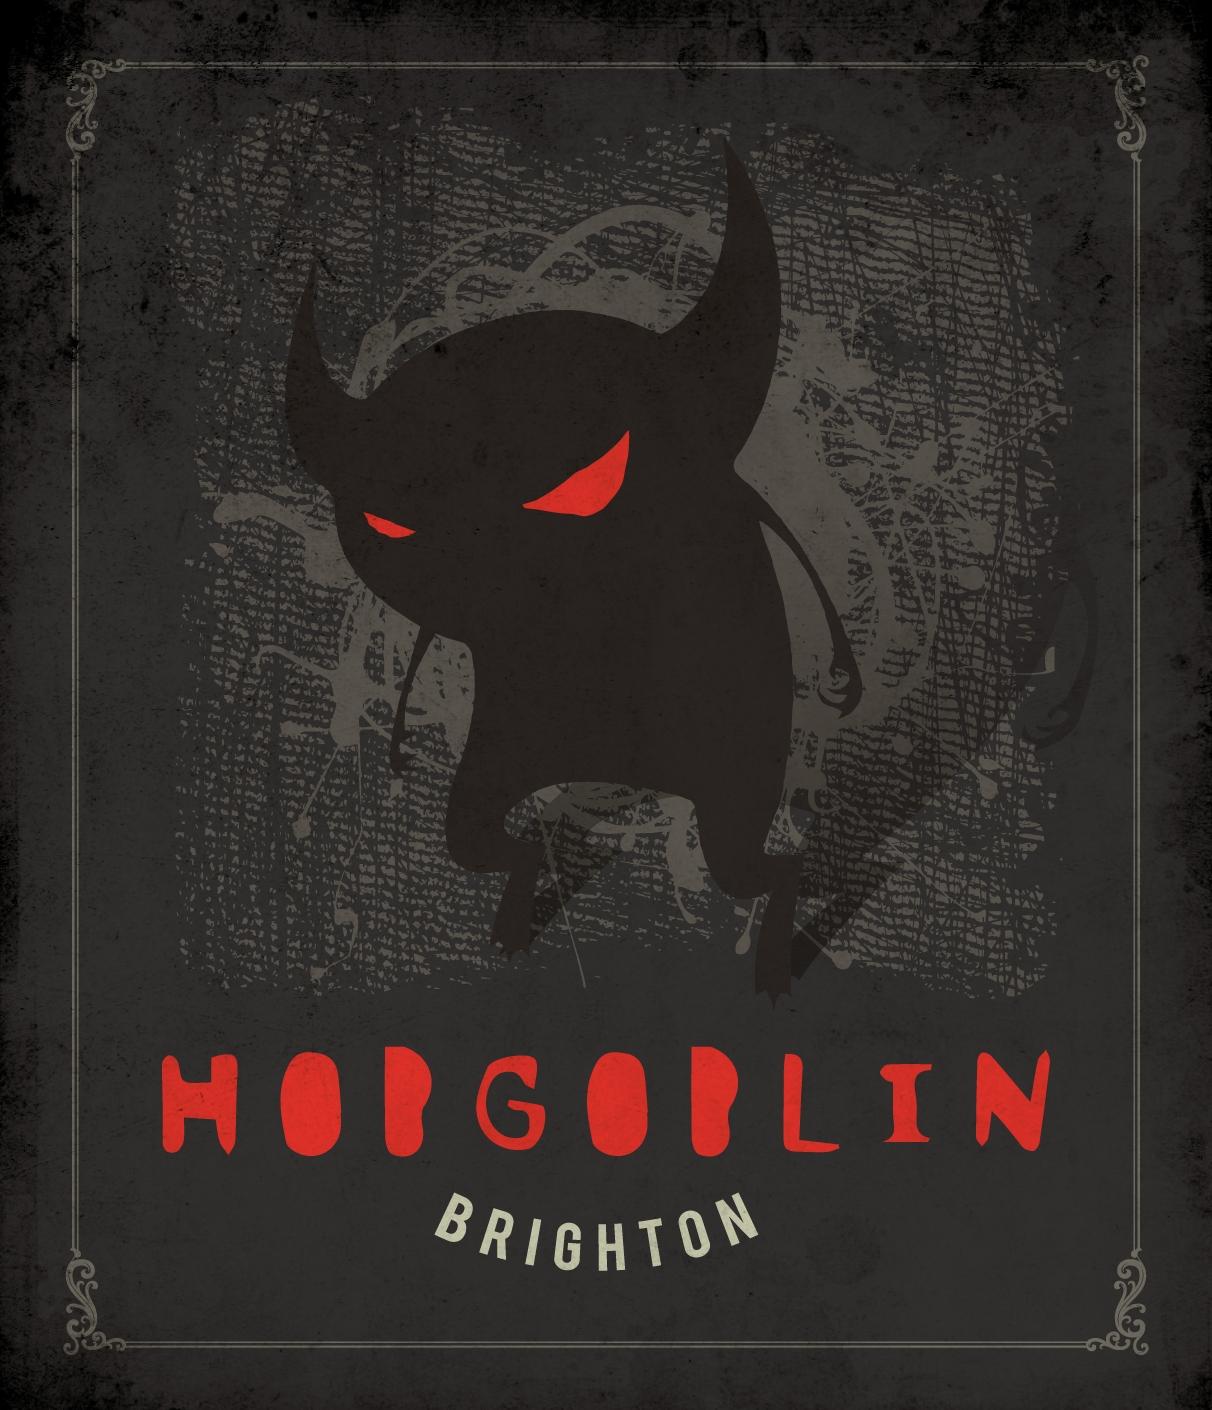 hobgoblin brighton